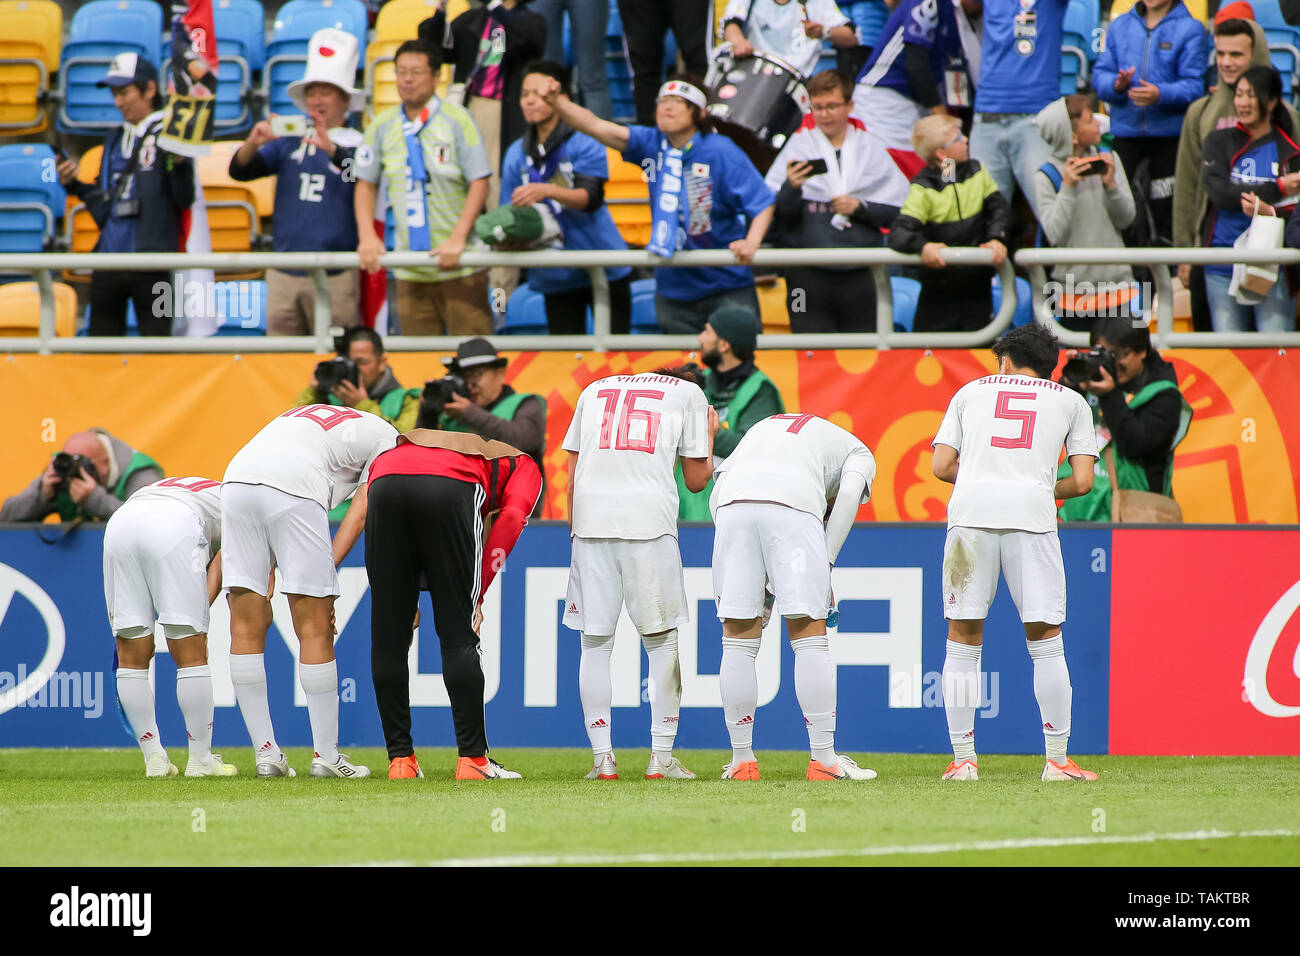 Gdynia Stadium, Gdynia, Poland - 26th May, 2019: Mitsuki Saito (c), Taichi Hara, Kota Yamada, Ayumu Seko, Yukinari Sugawara from Japan are seen bowing in front of Japan fans after FIFA U-20 World Cup match between Mexico and Japan (GROUP B) in Gdynia. (Final score; Mexico 0:3 Japan) - Stock Image